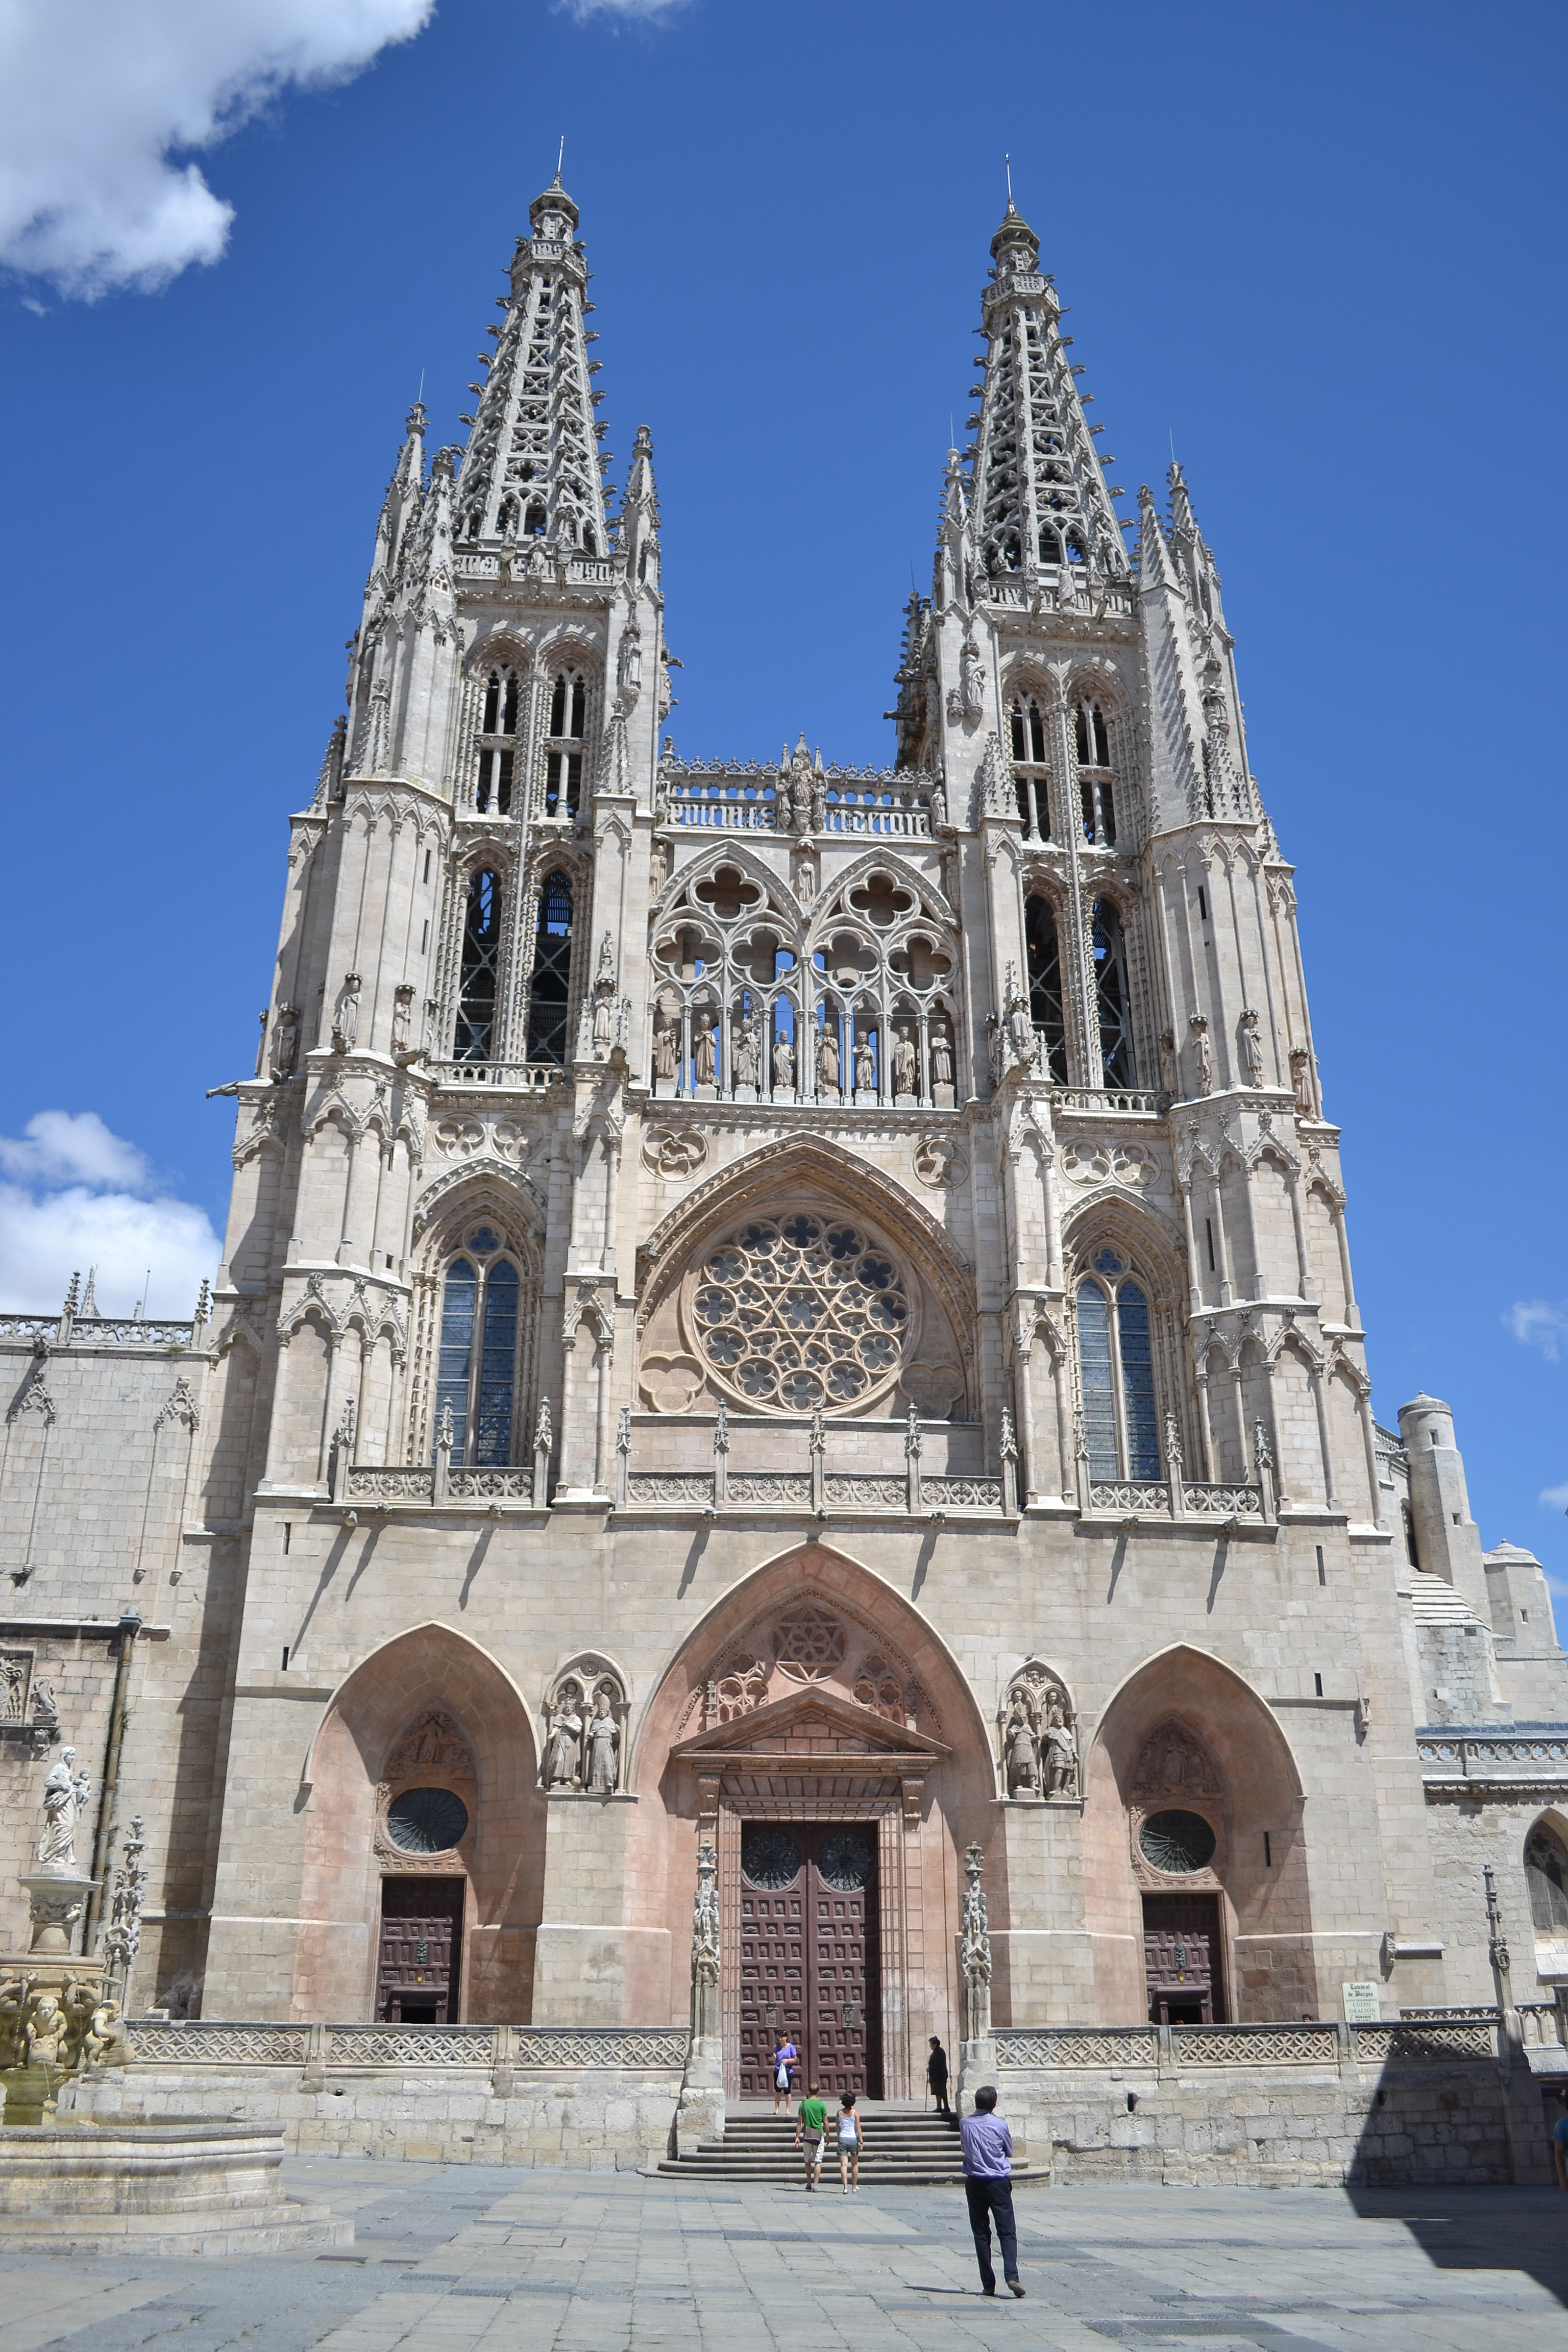 File:Catedral de Santa María - Burgos.jpg - Wikimedia Commons